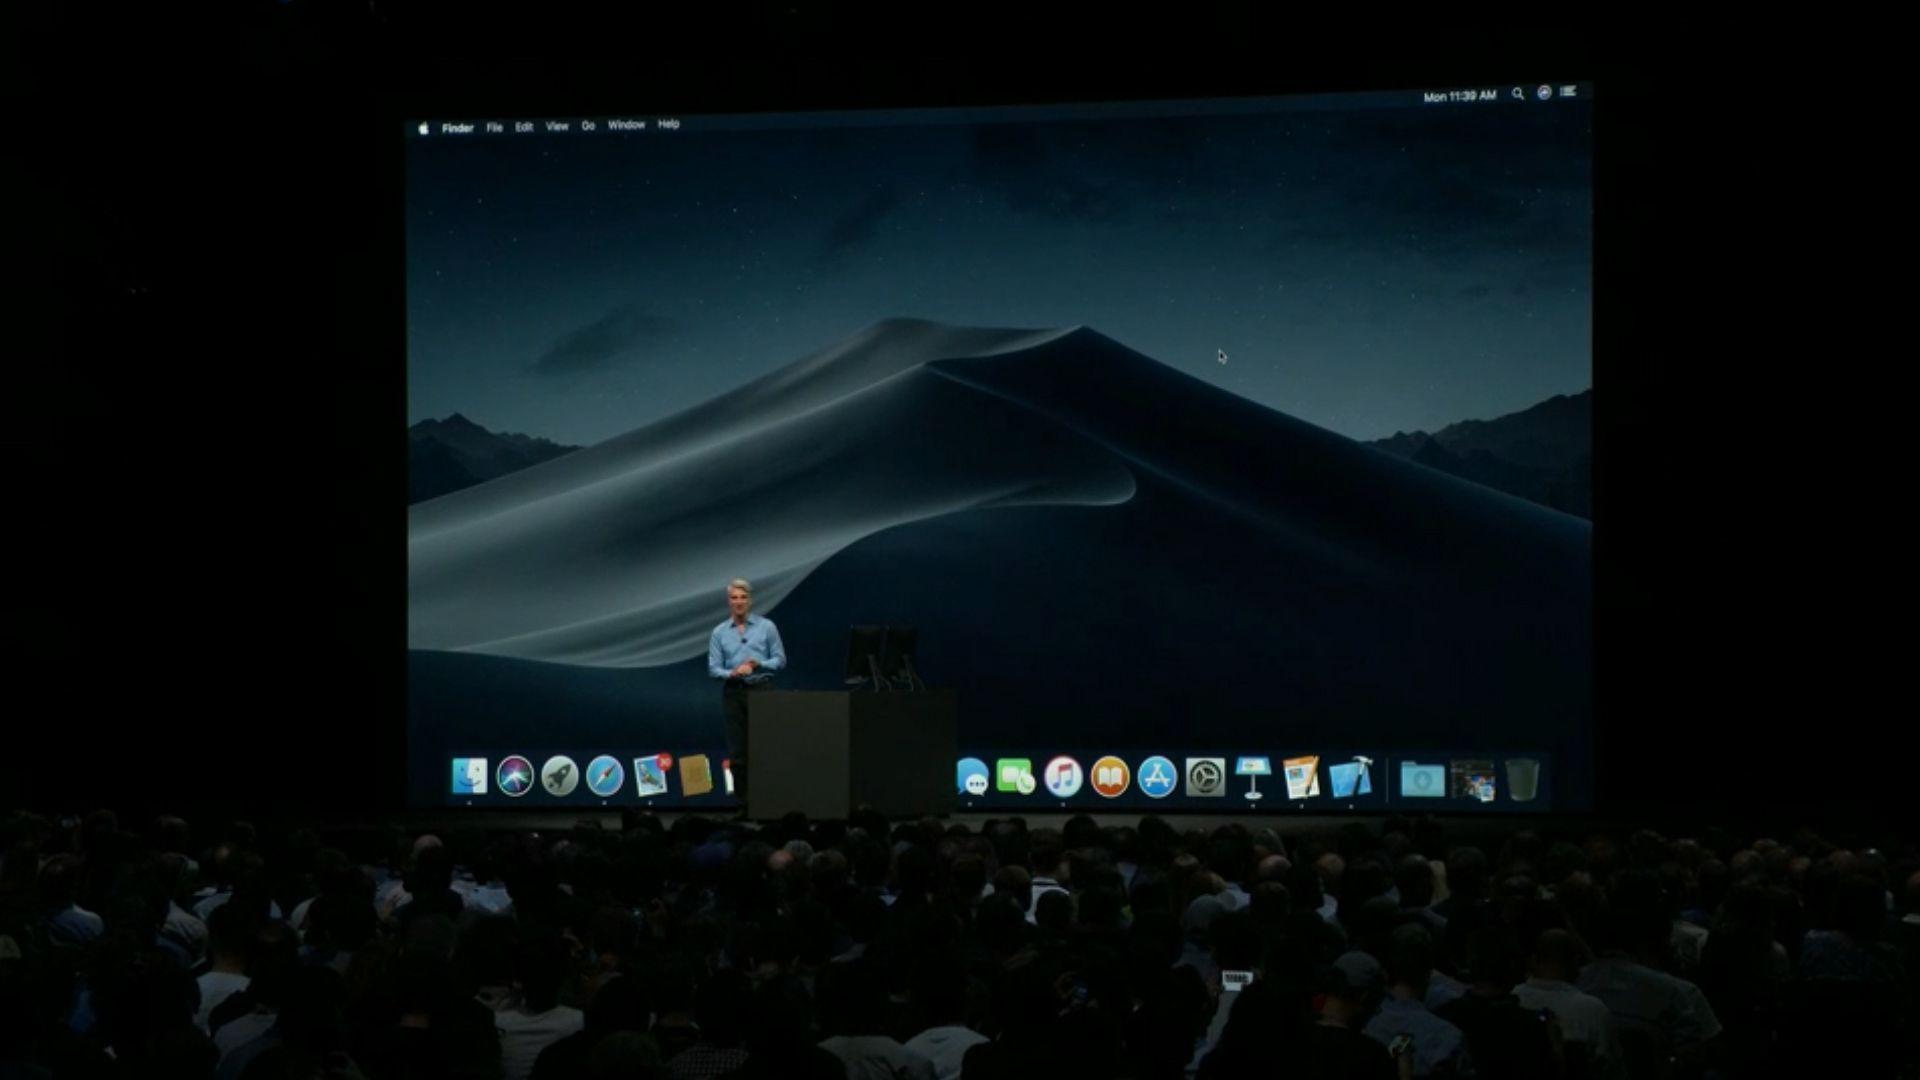 Macos Mojave Update Announced With Dark Mode Desktop Stacks